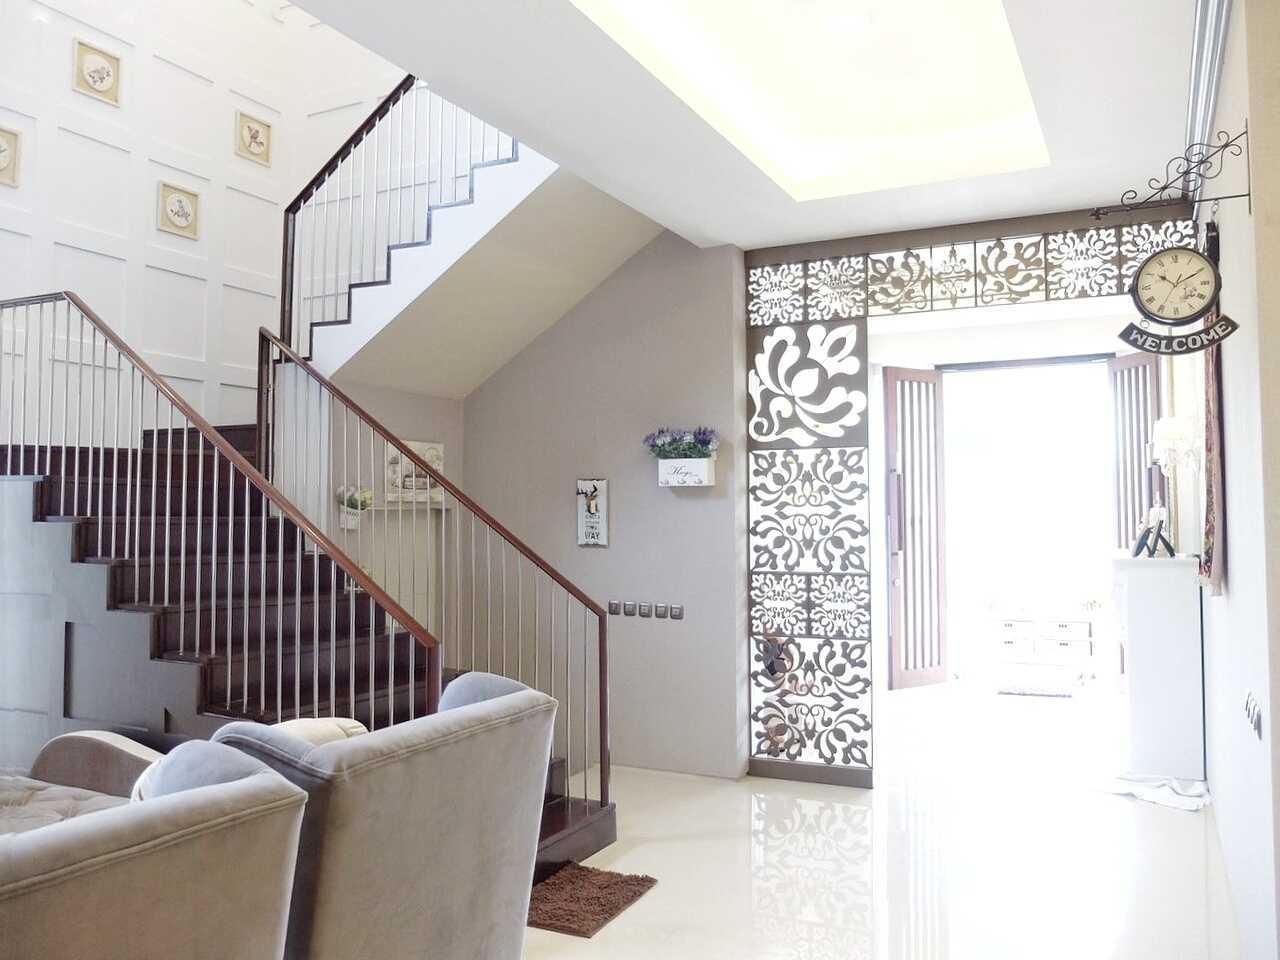 7Design Architect Mrs. D House Citrasun, Yogjakarta Citrasun, Yogjakarta 1St Floor Area Klasik 18694